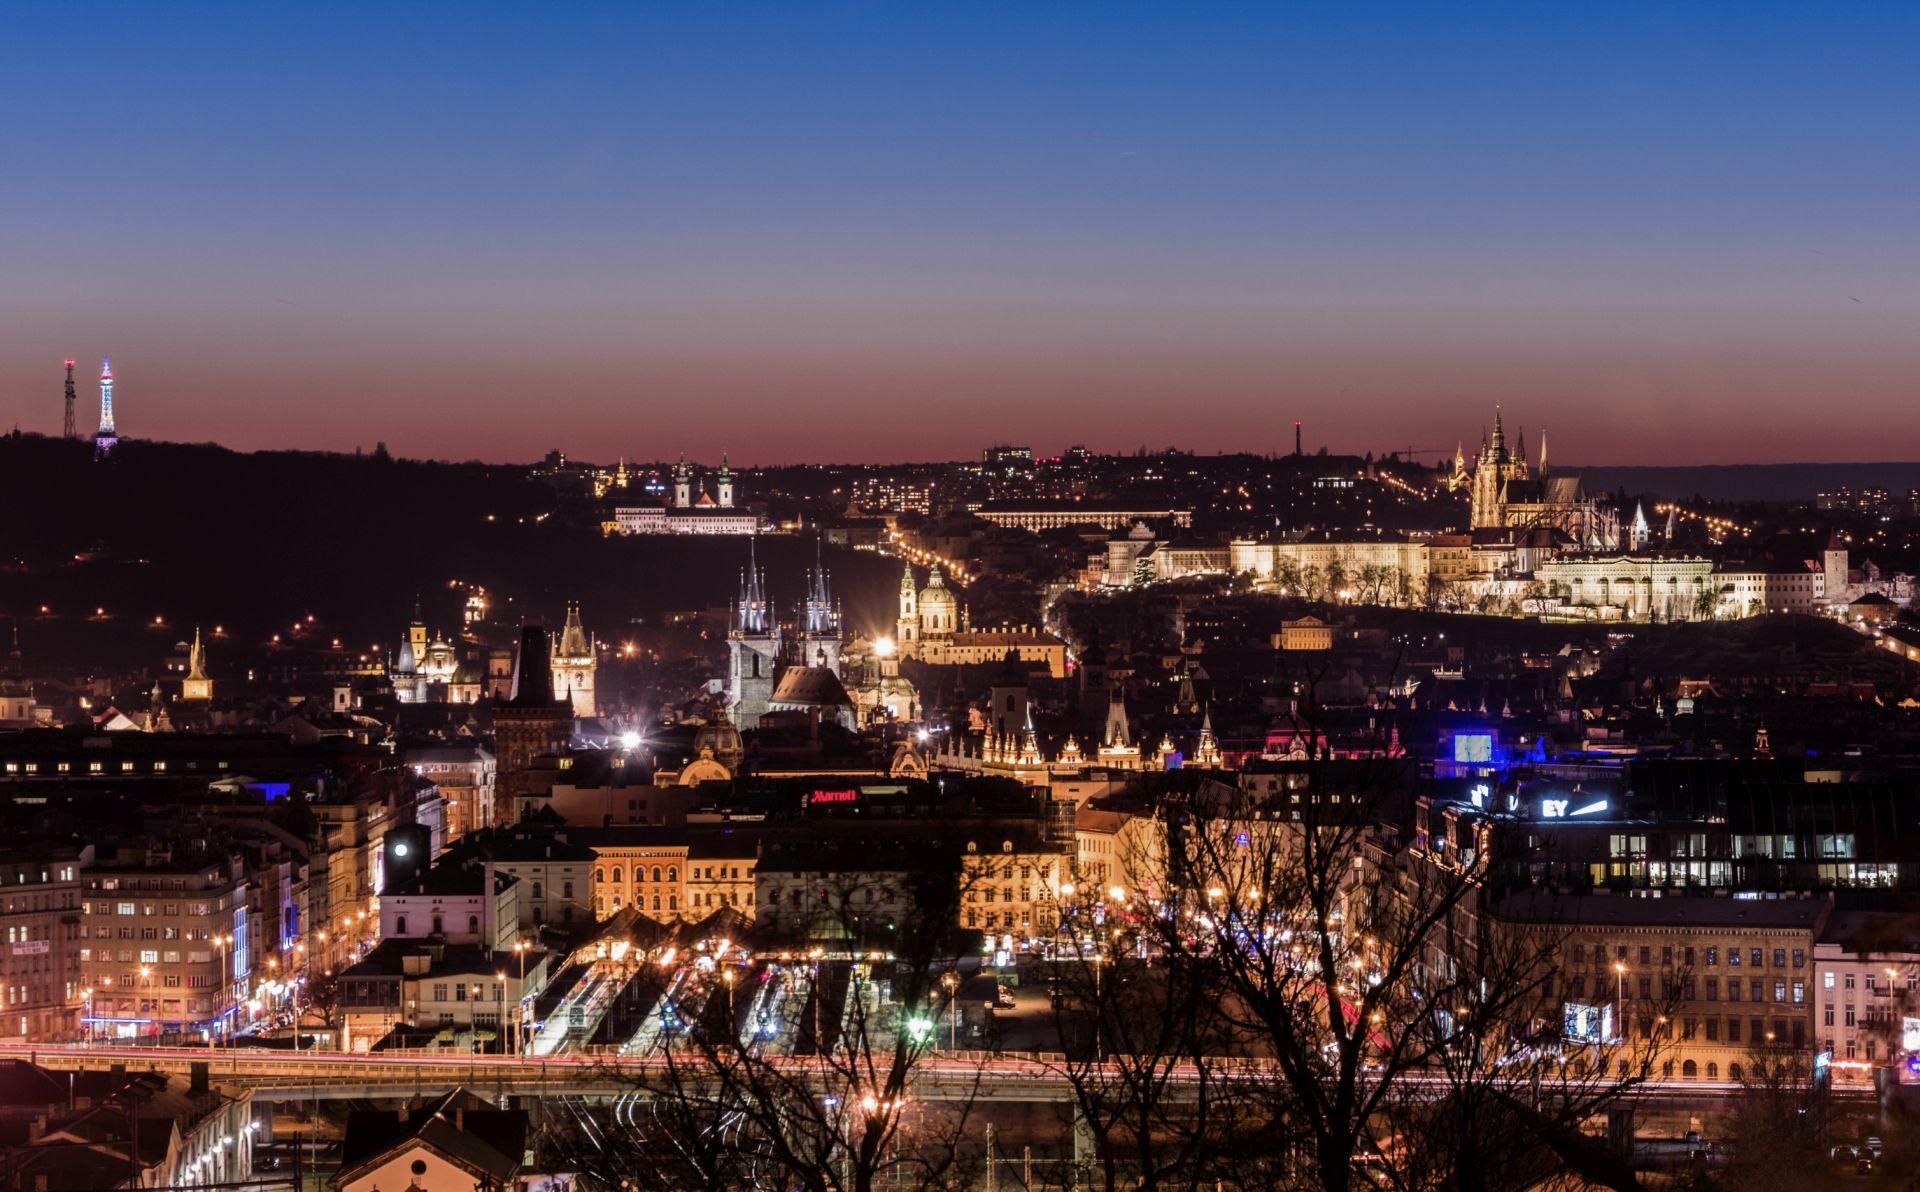 The Prague Castle seen from the Vitkov Hill, Czech Republic